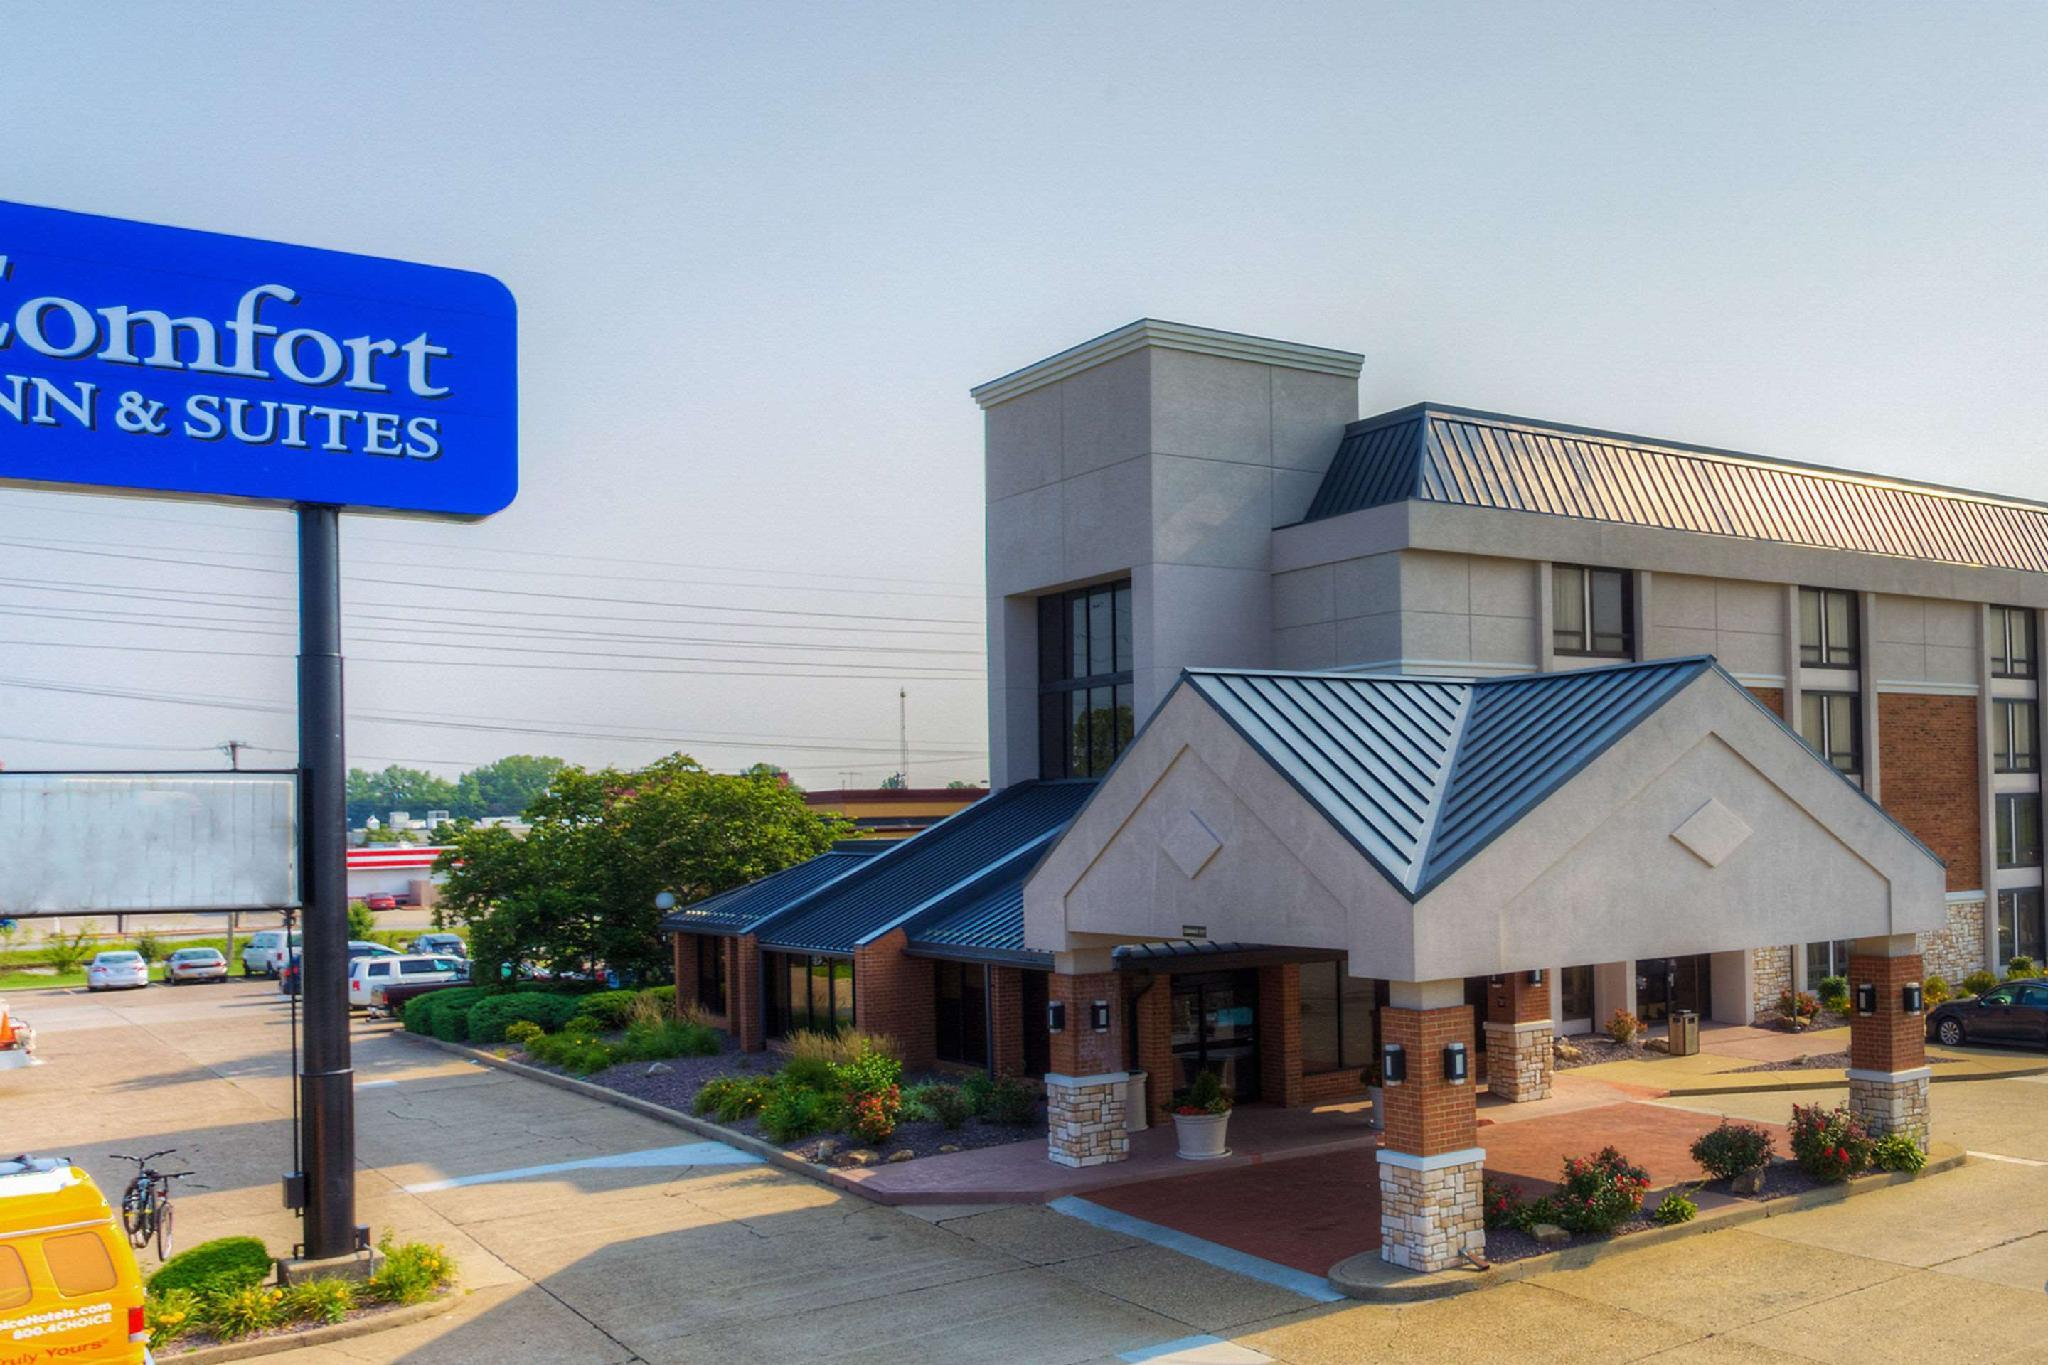 Comfort Inn And Suites Evansville Airport